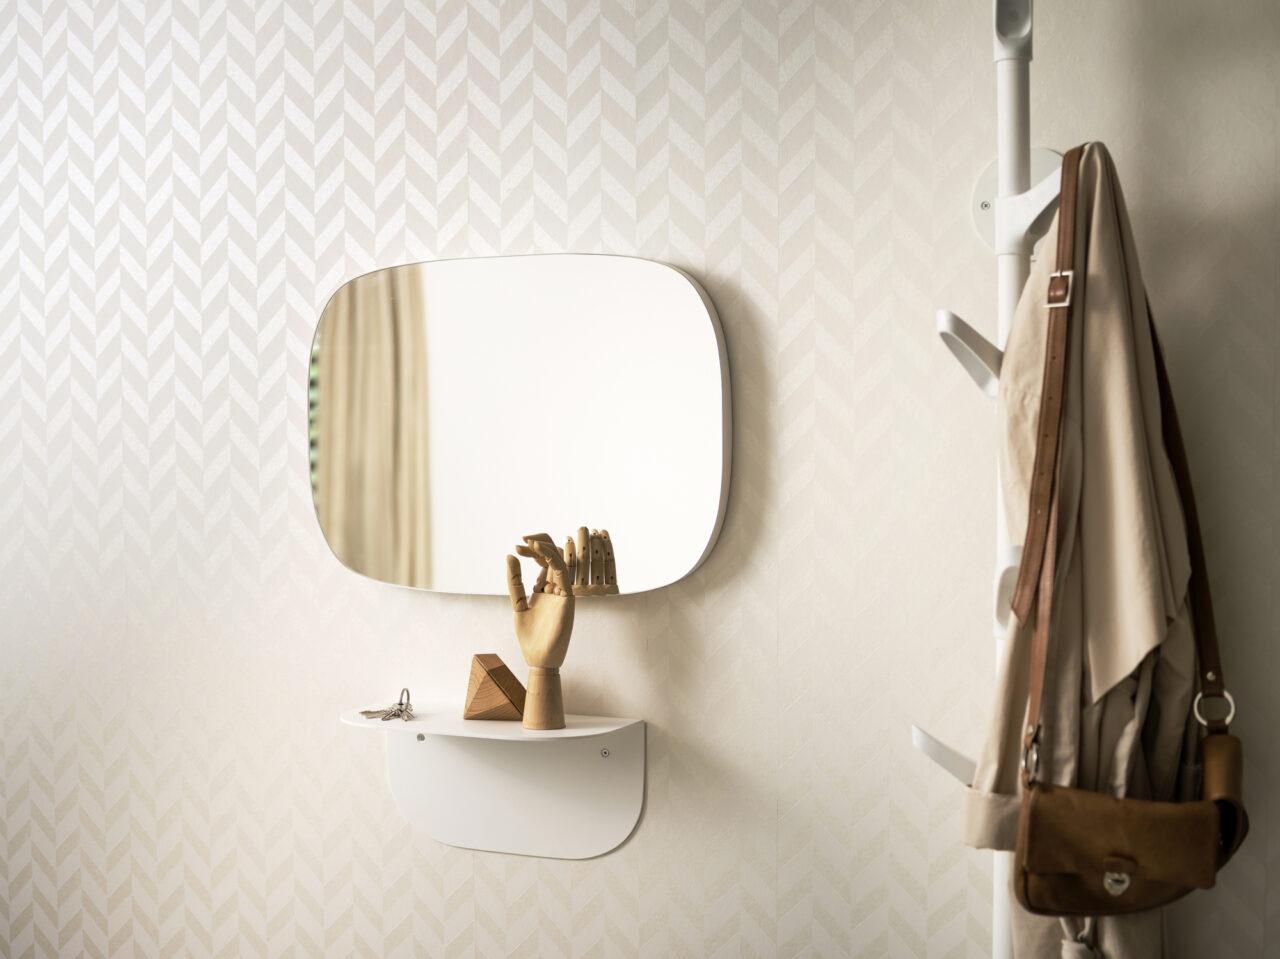 van Esch miroir Slide S